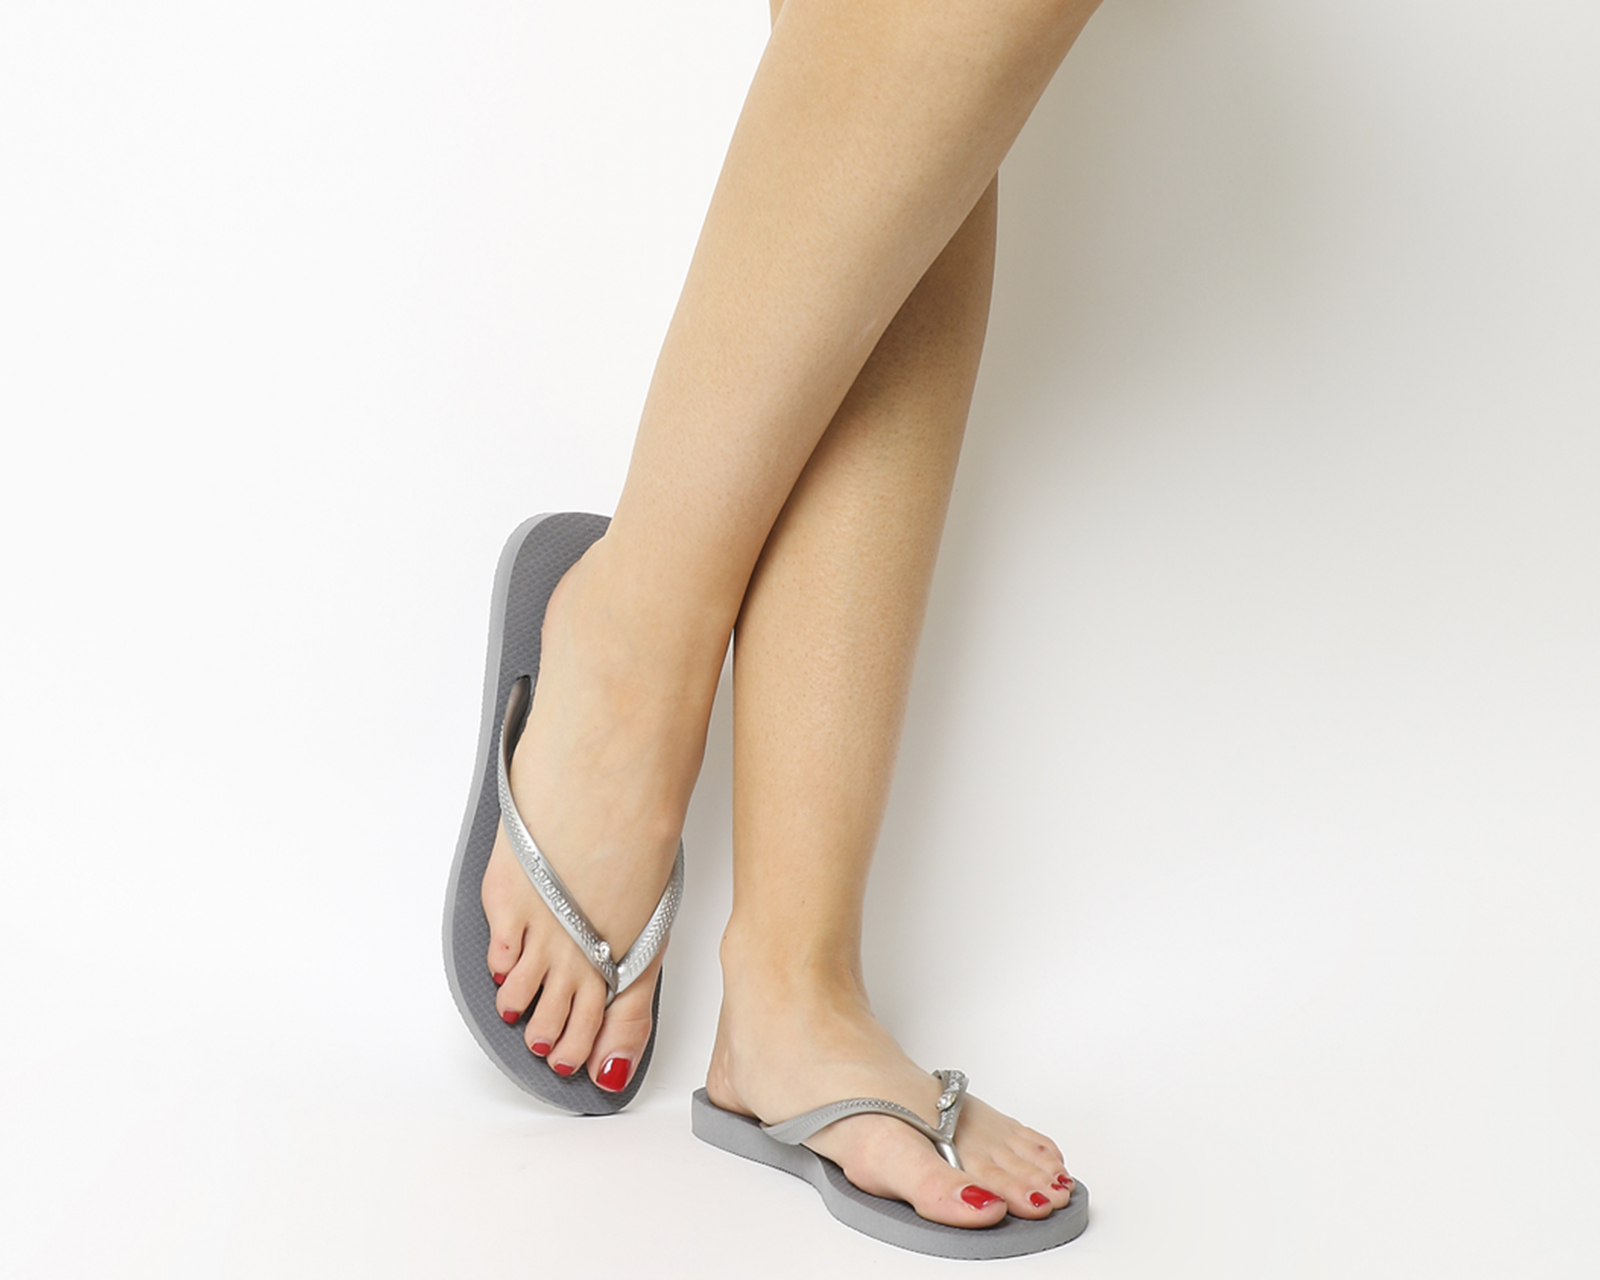 7b2dbda92677 Sentinel Womens Havaianas Slim Crystal Glamour Steel Grey Sandals